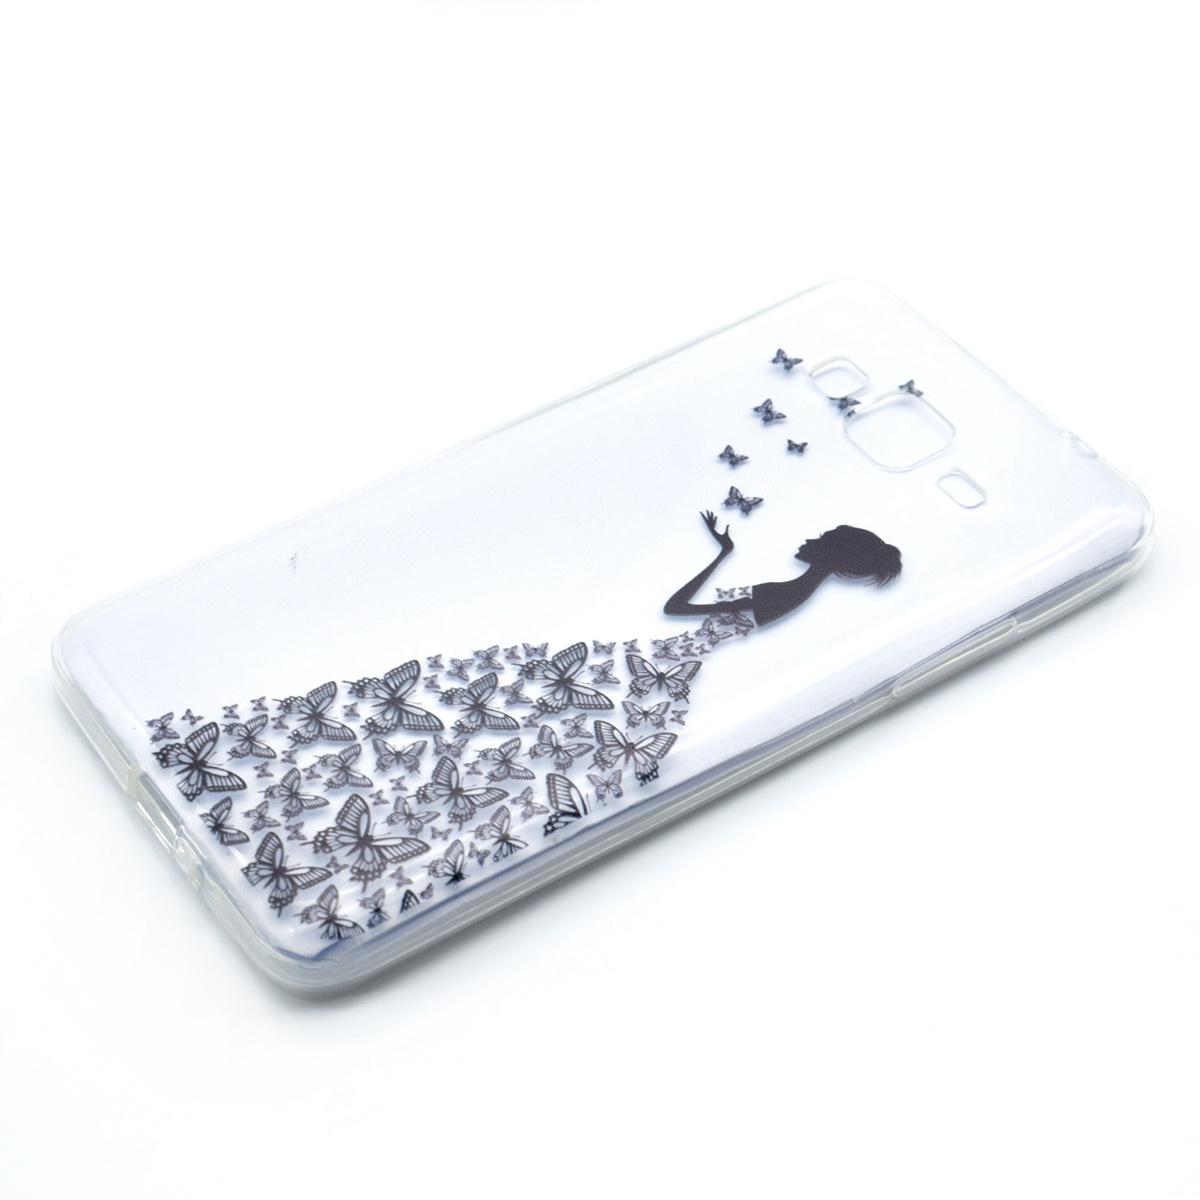 Мягкий чехол для телефона Samsung Galaxy Core Prime G360